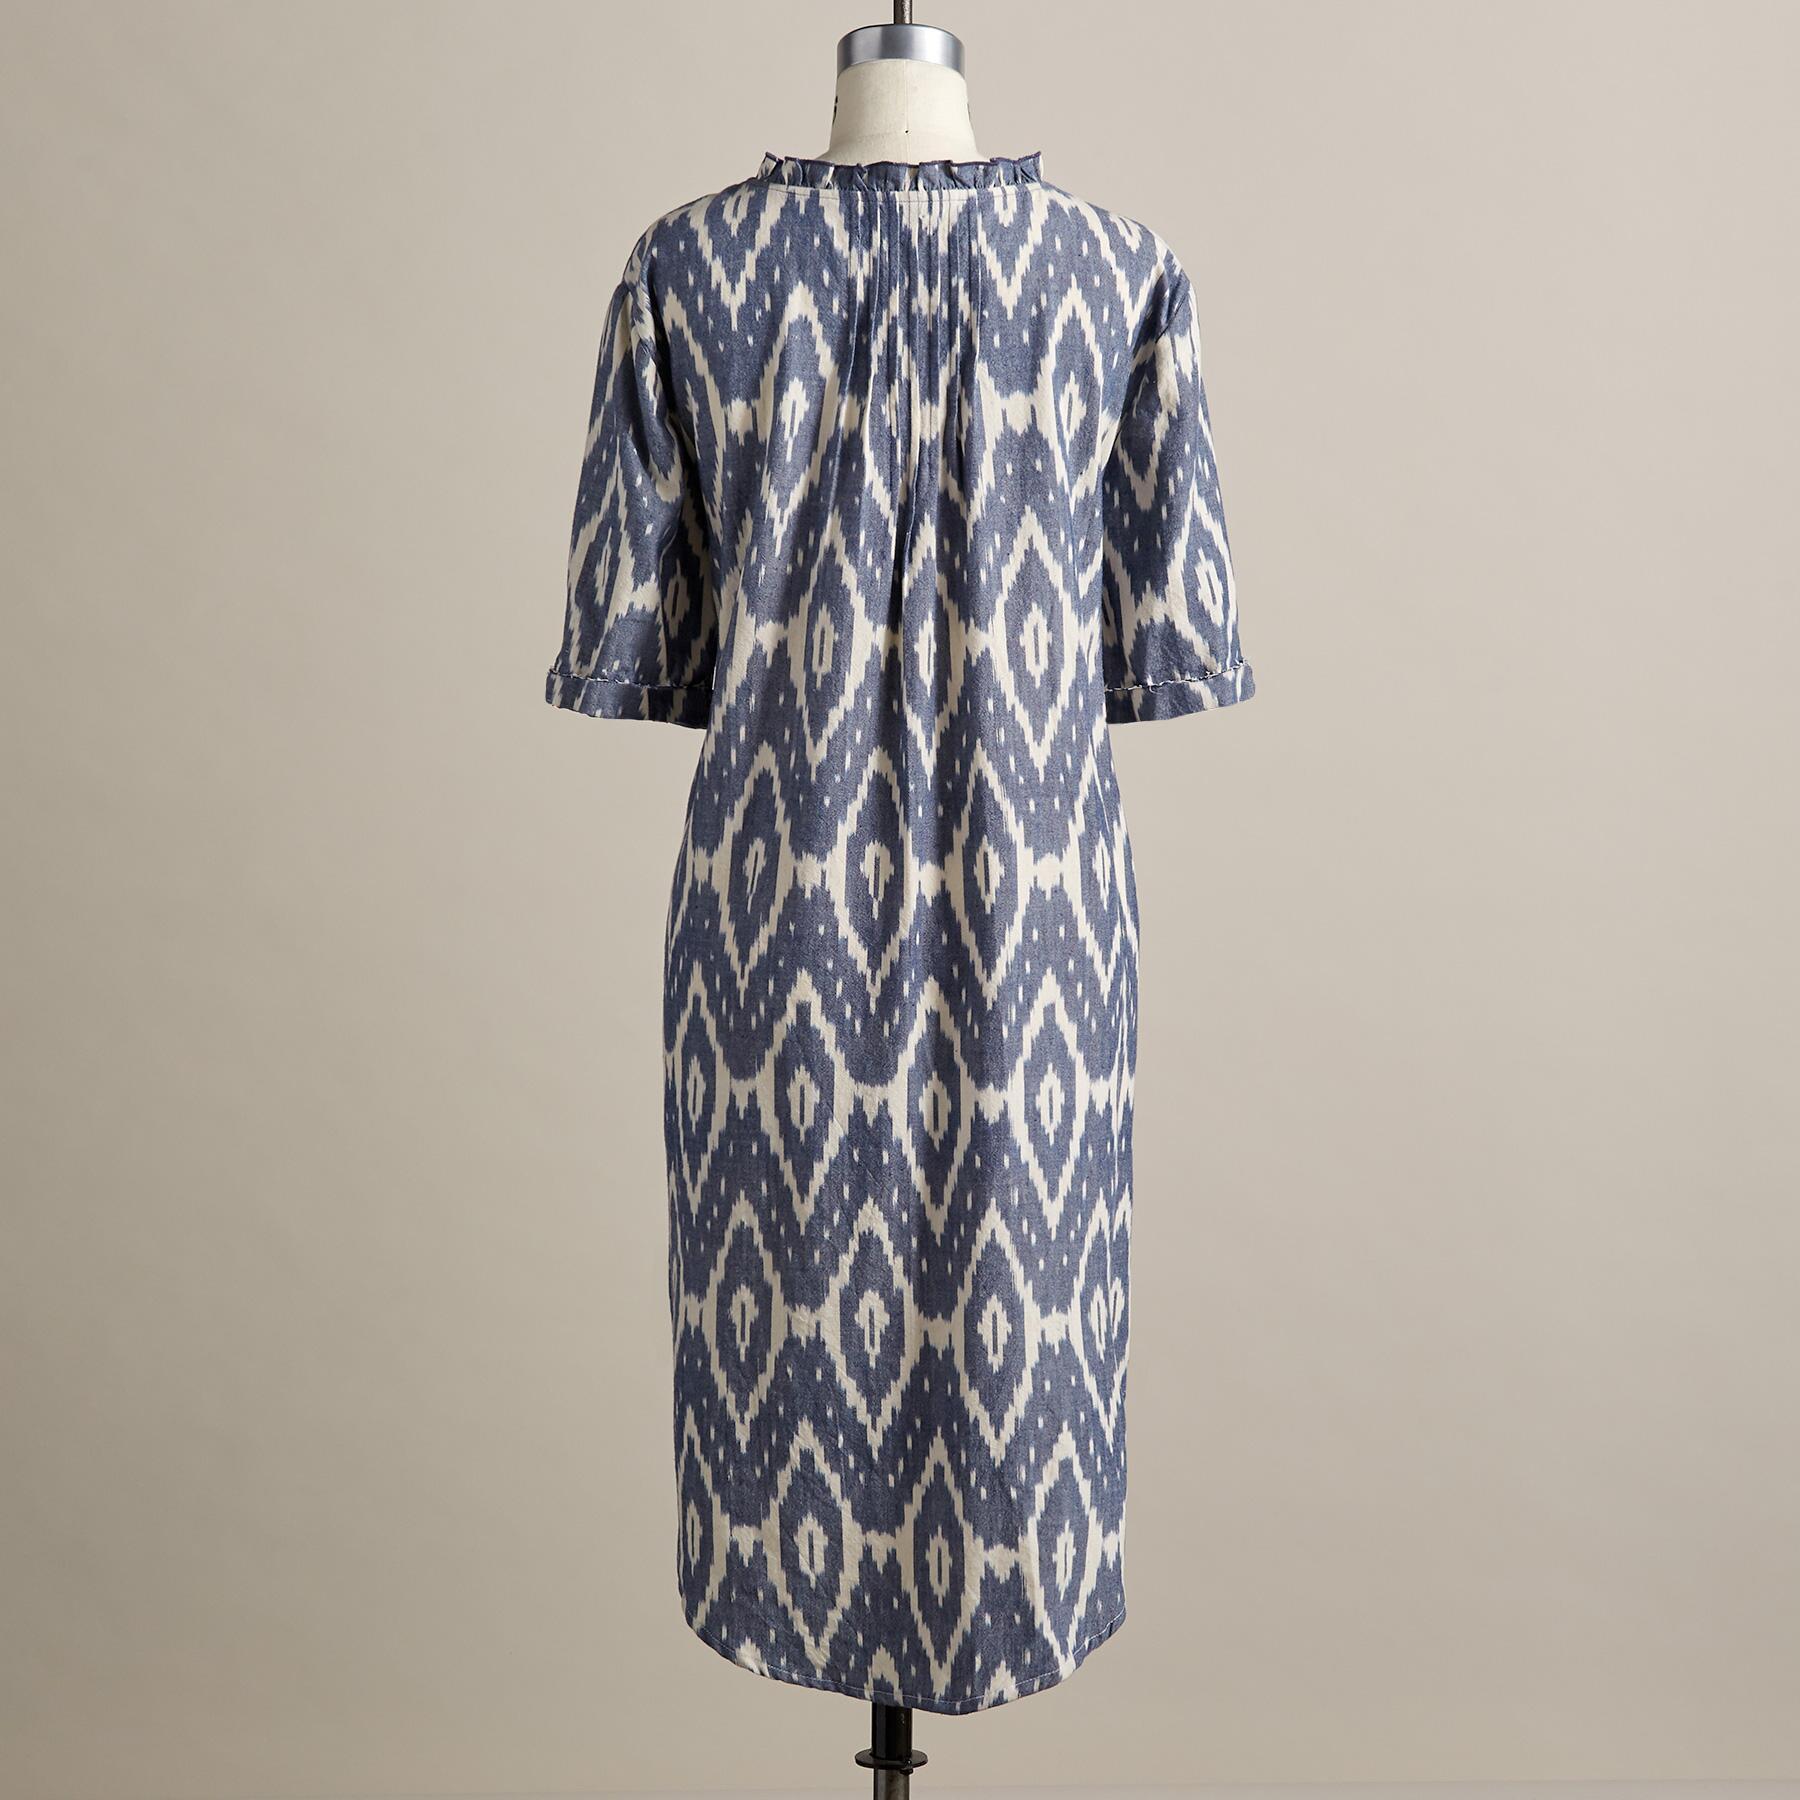 ISABEL IKAT DRESS - PETITES: View 3